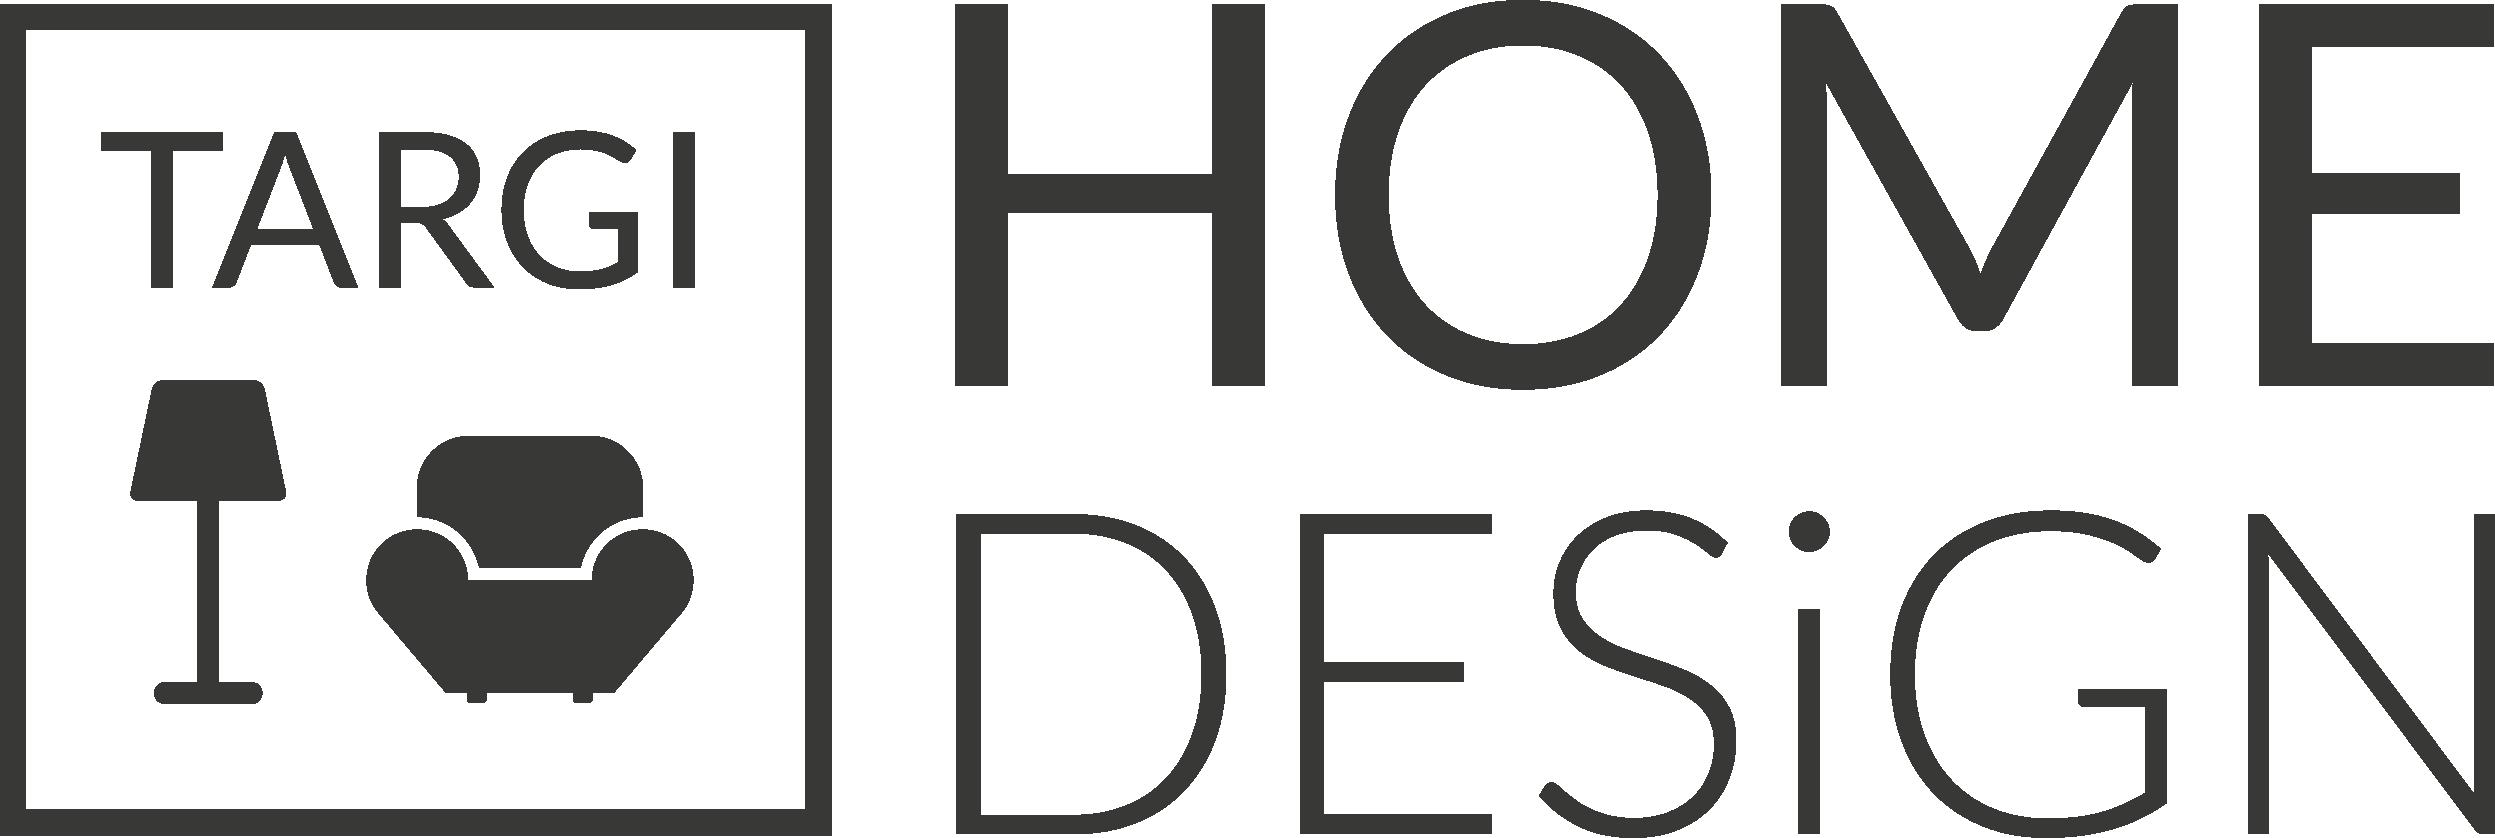 Łódzkie targi logo